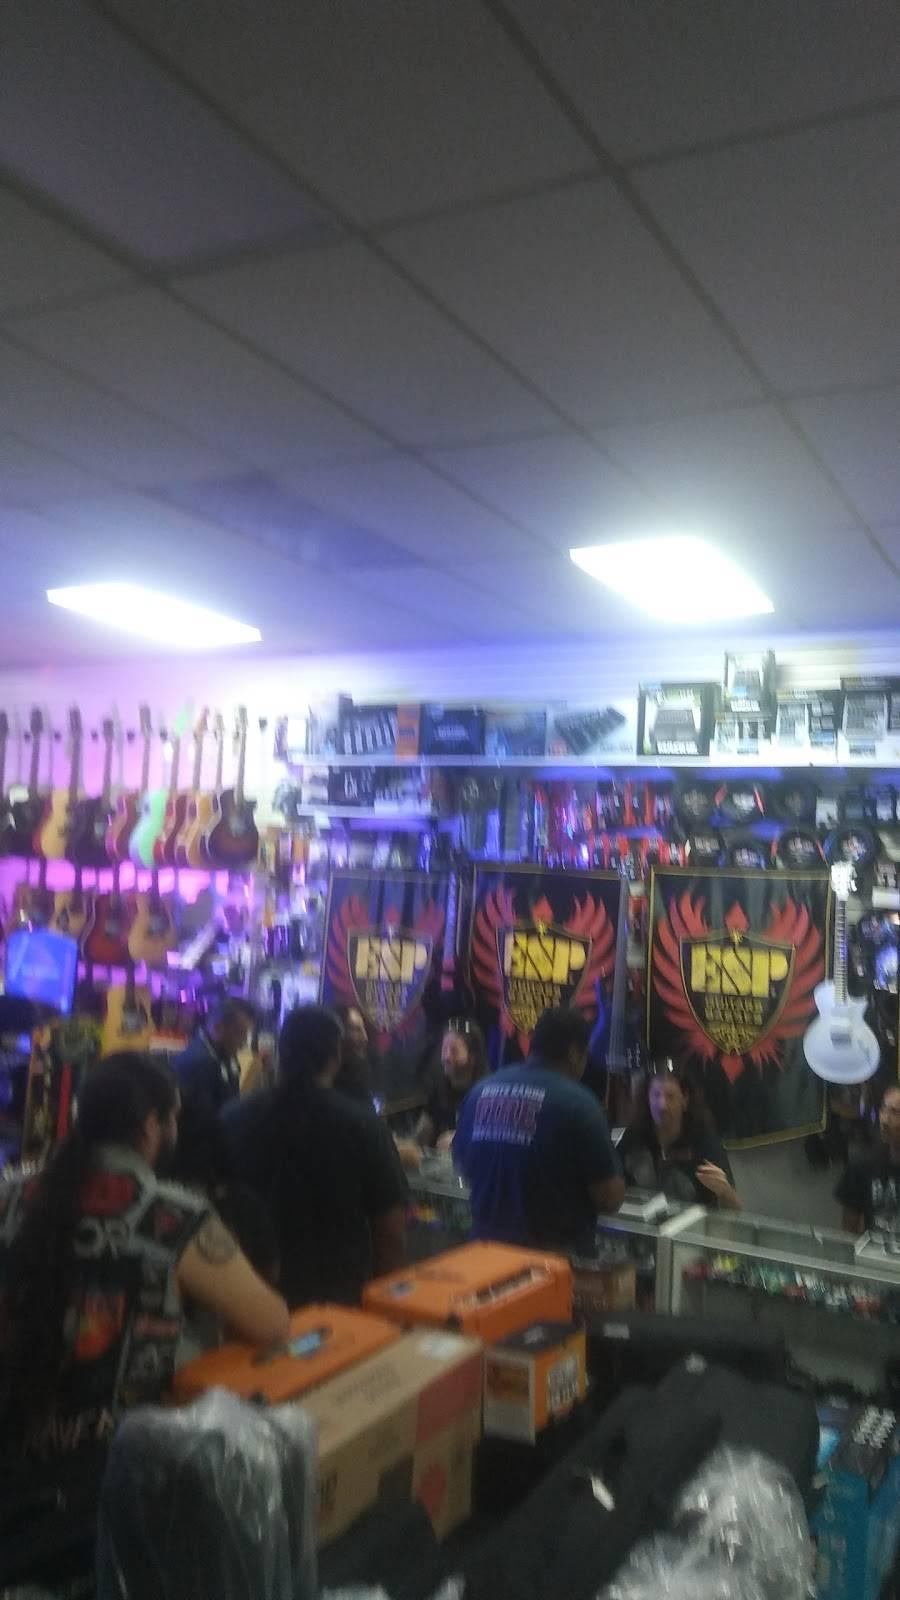 Hero Music - electronics store  | Photo 4 of 10 | Address: 6430 Gateway Blvd E suite b, El Paso, TX 79905, USA | Phone: (915) 594-4999